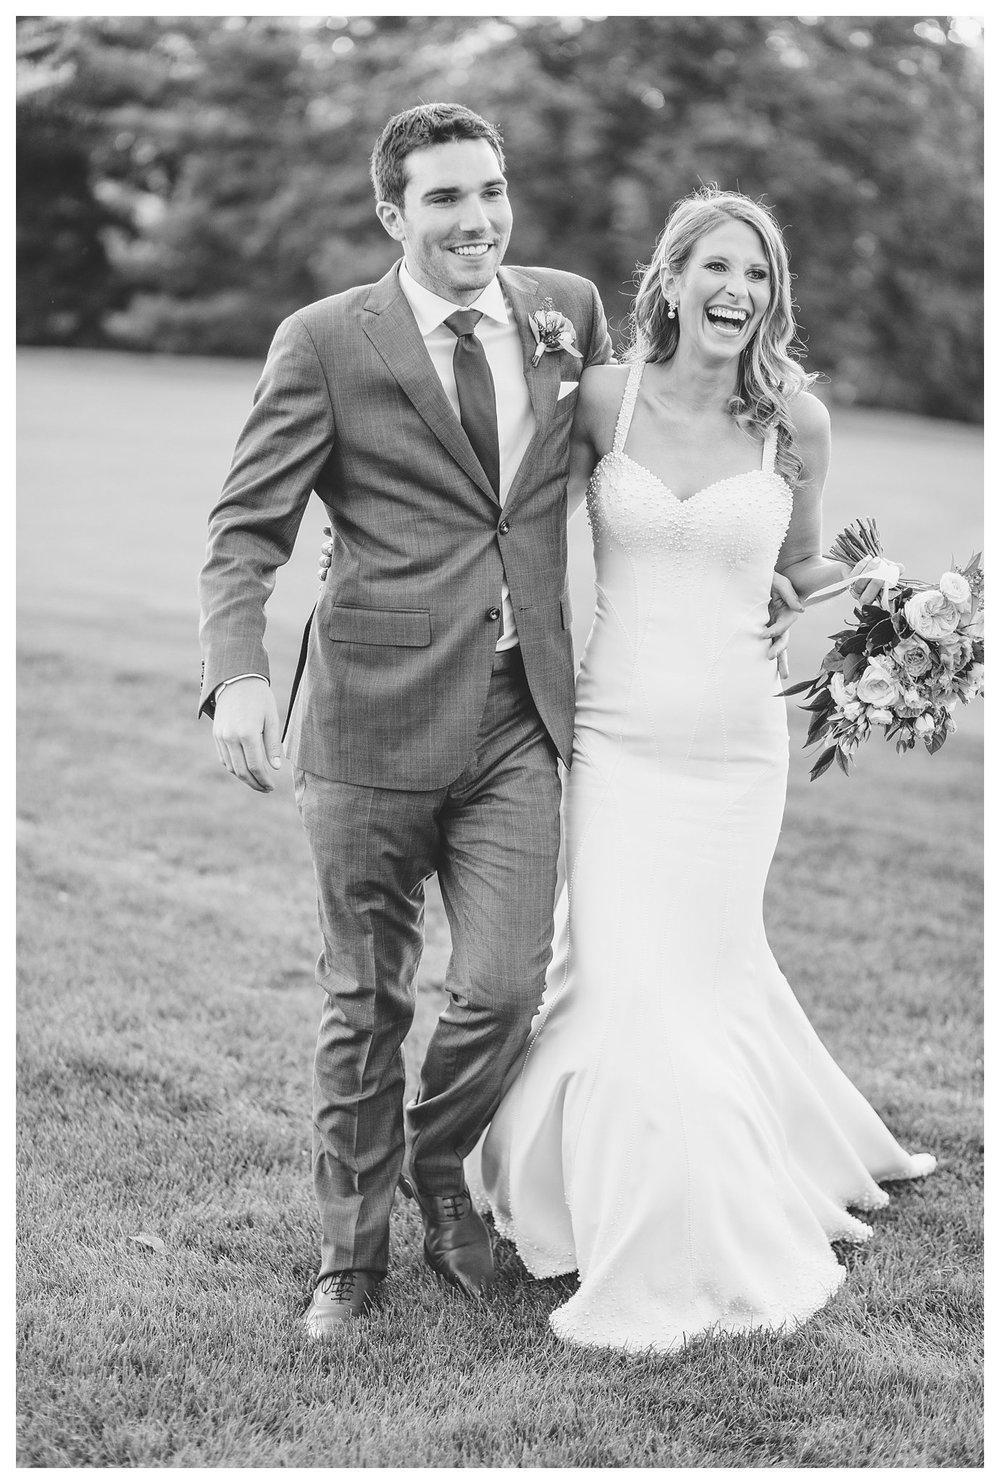 everleighphotography-cincinnati-wedding-photographer-northern-kentucky-wedding-photographer-camargo-country-club-the-karsh-wedding-37